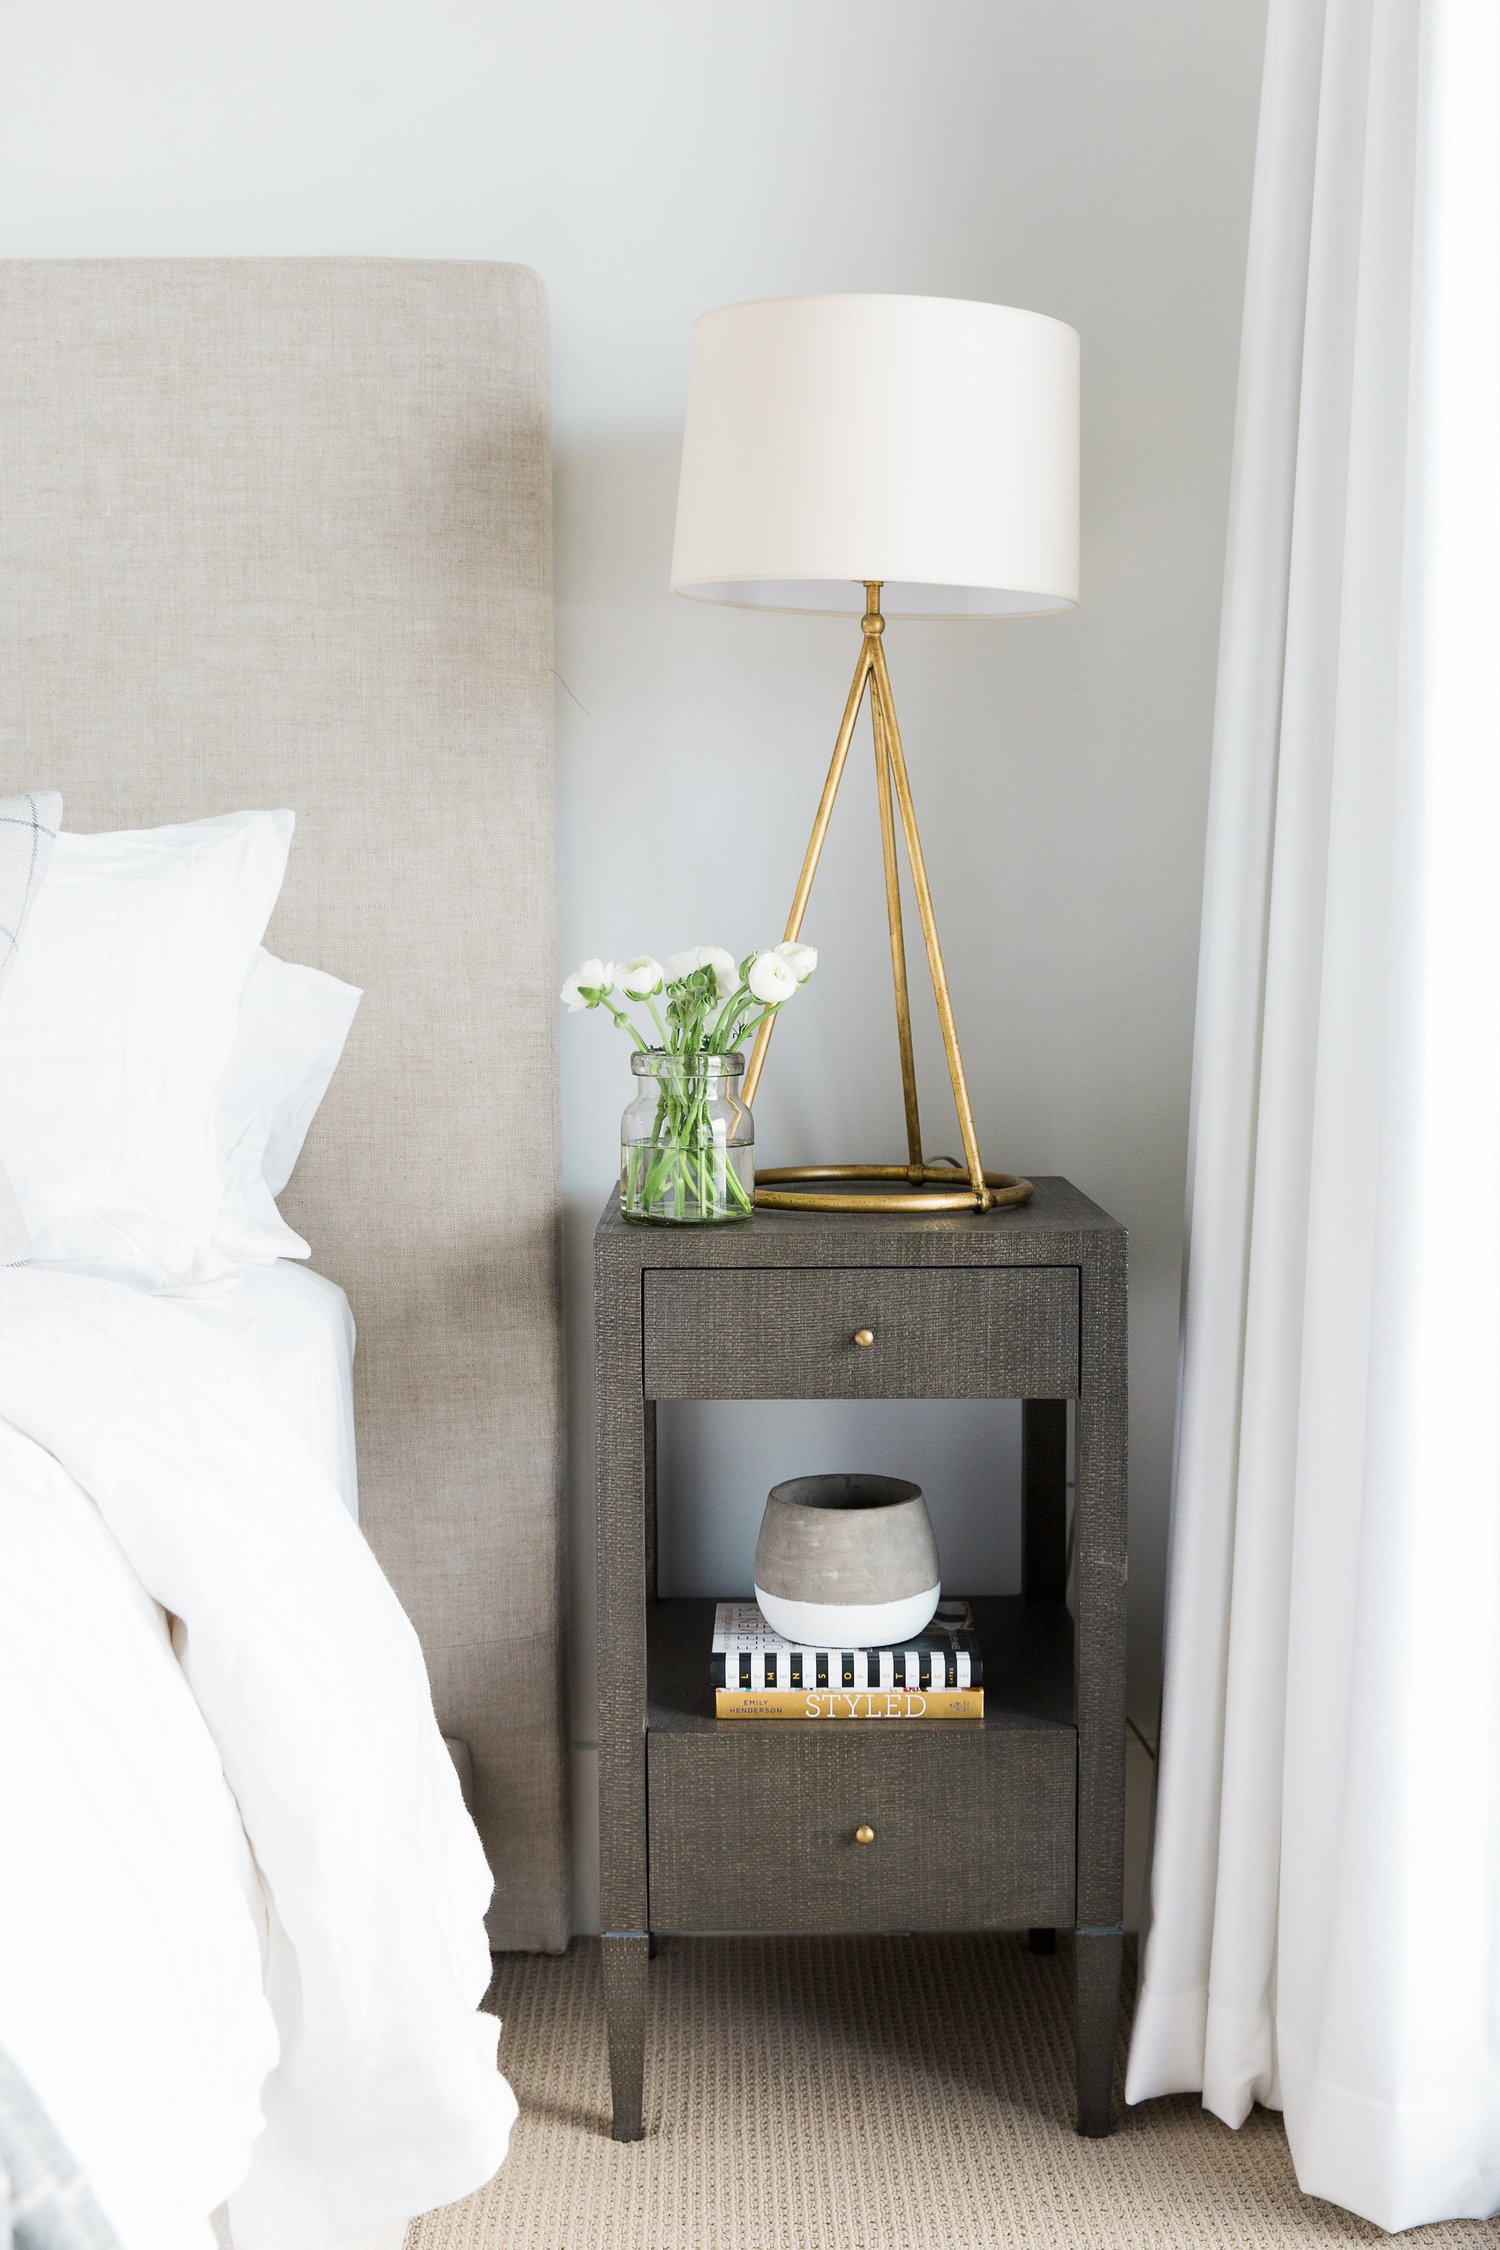 Small, dark nightstand next to bed